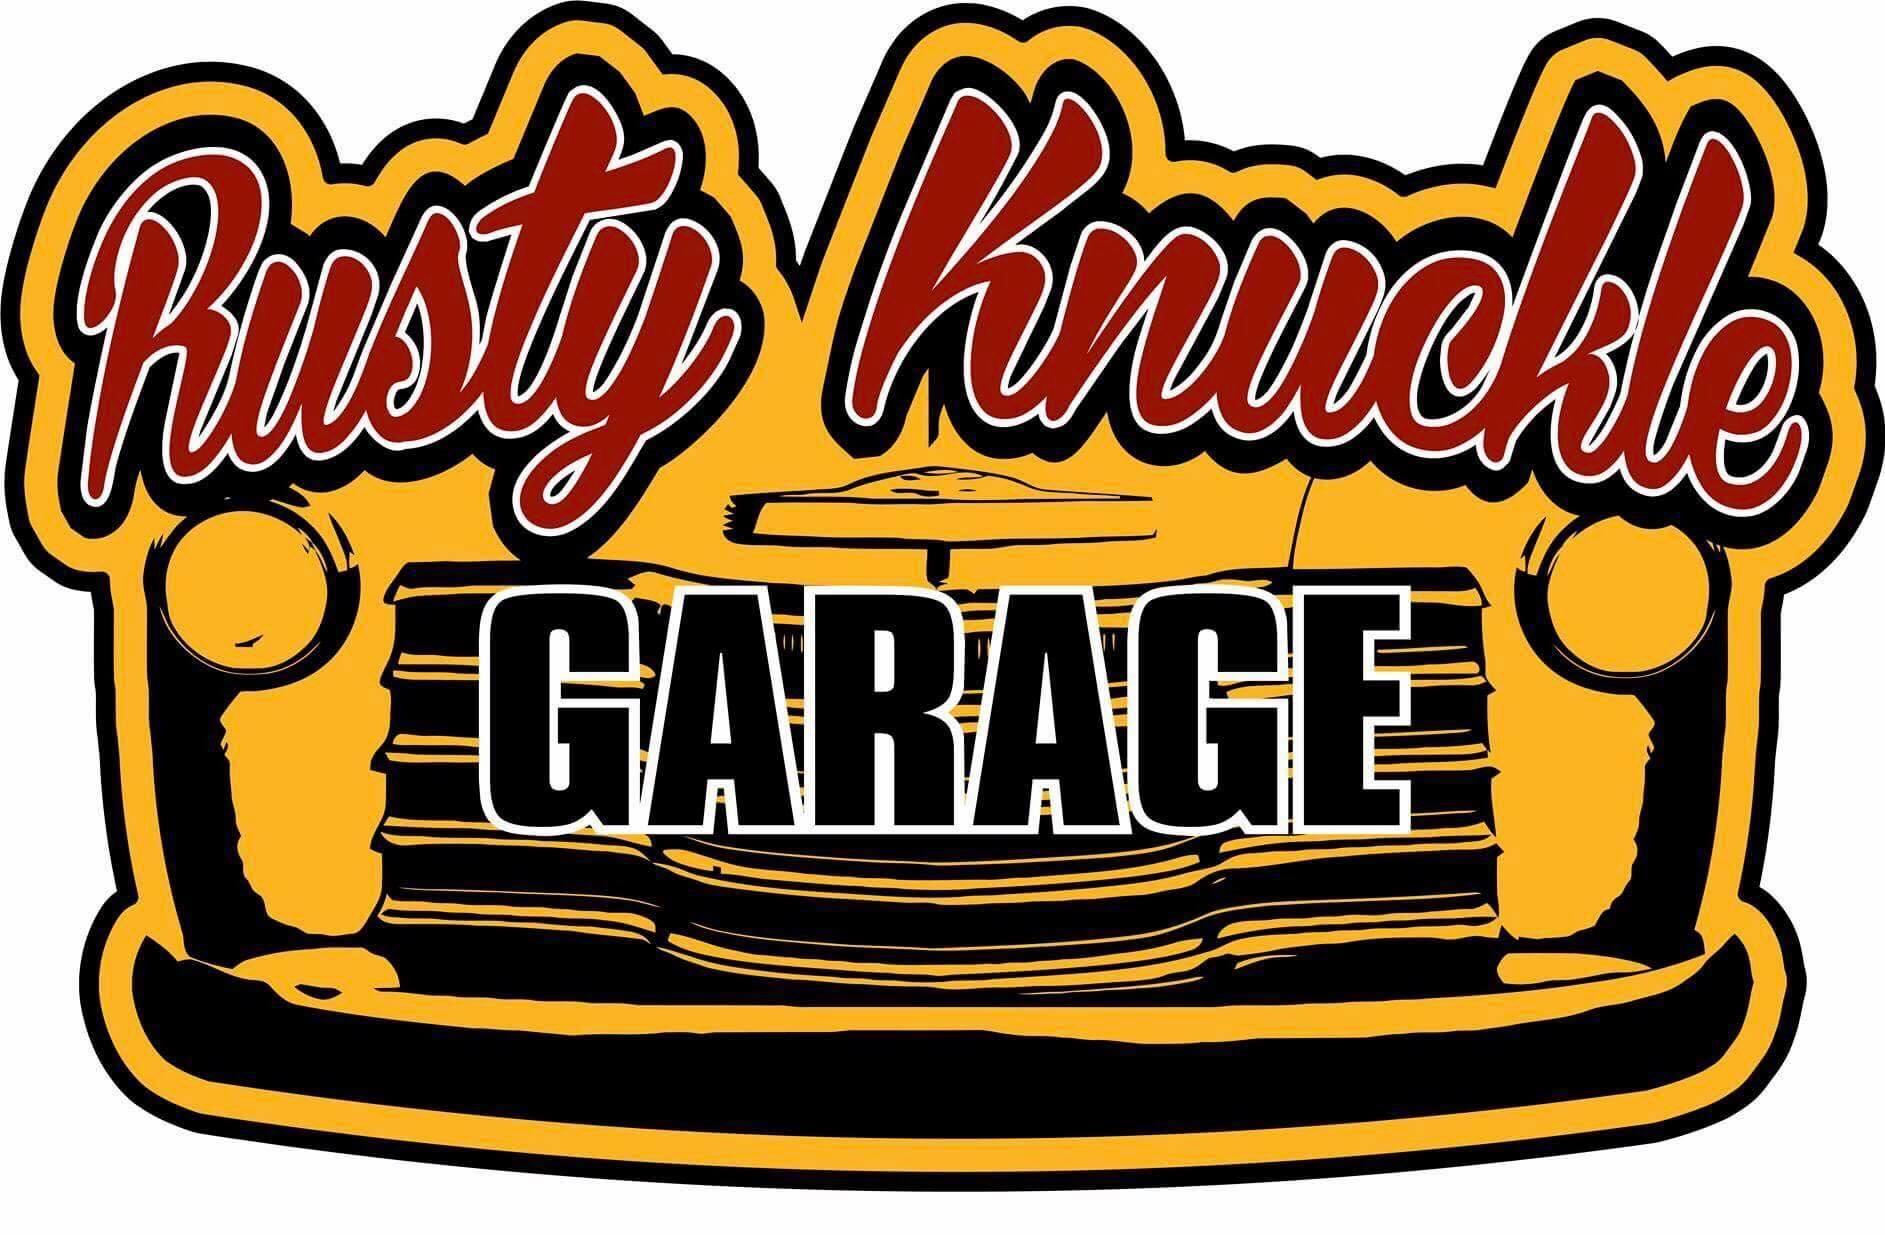 Rusty Knuckle Garag